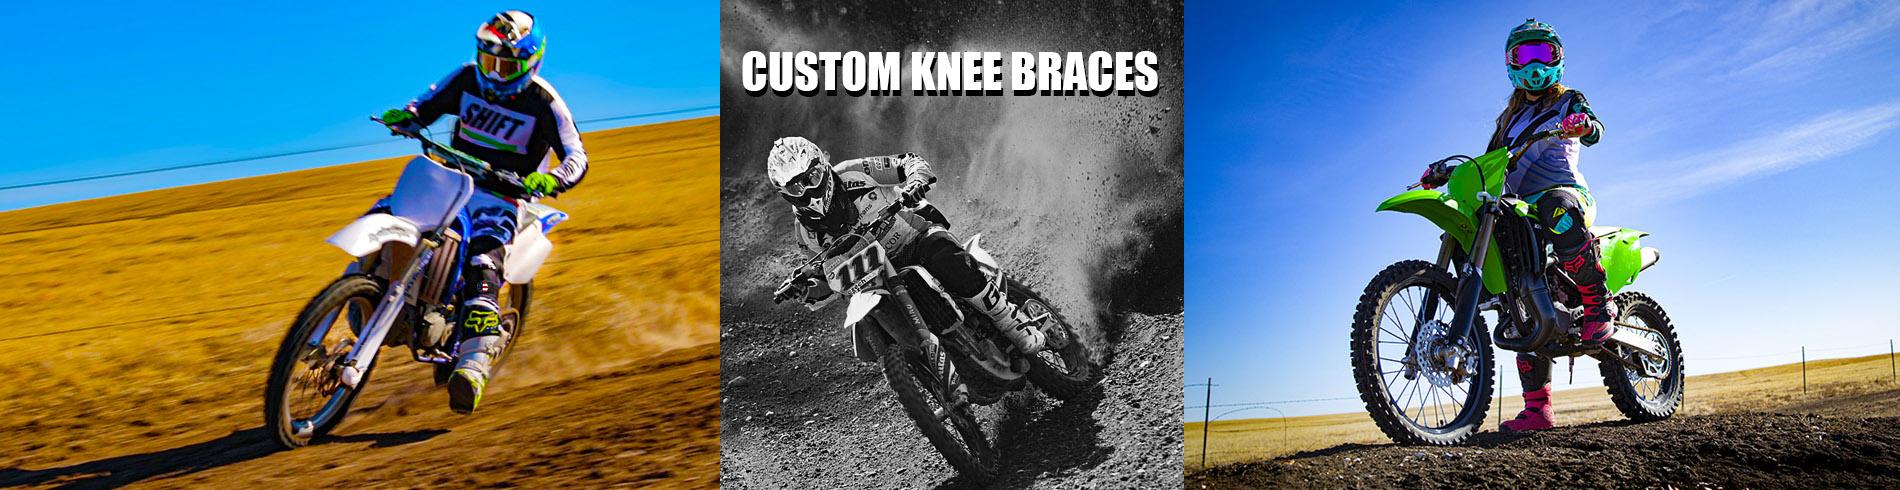 Knee Braces for Motorcylists